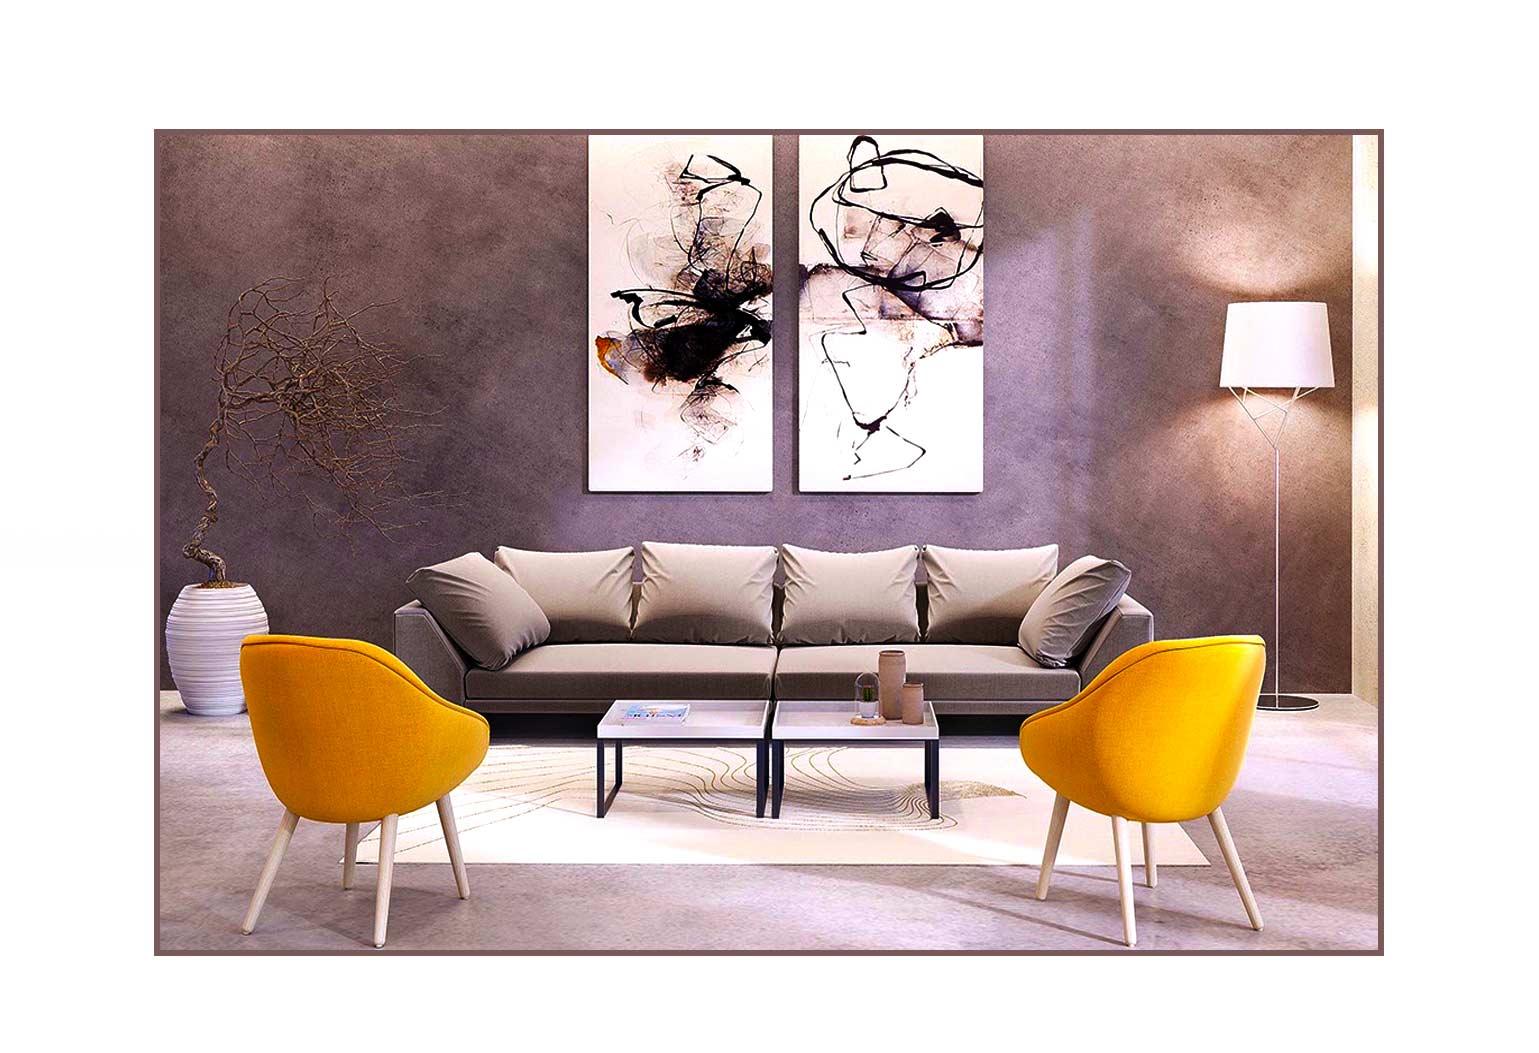 Design An Art centric Room01jpg - چگونه یک اتاق هنری را طراحی کنیم؟